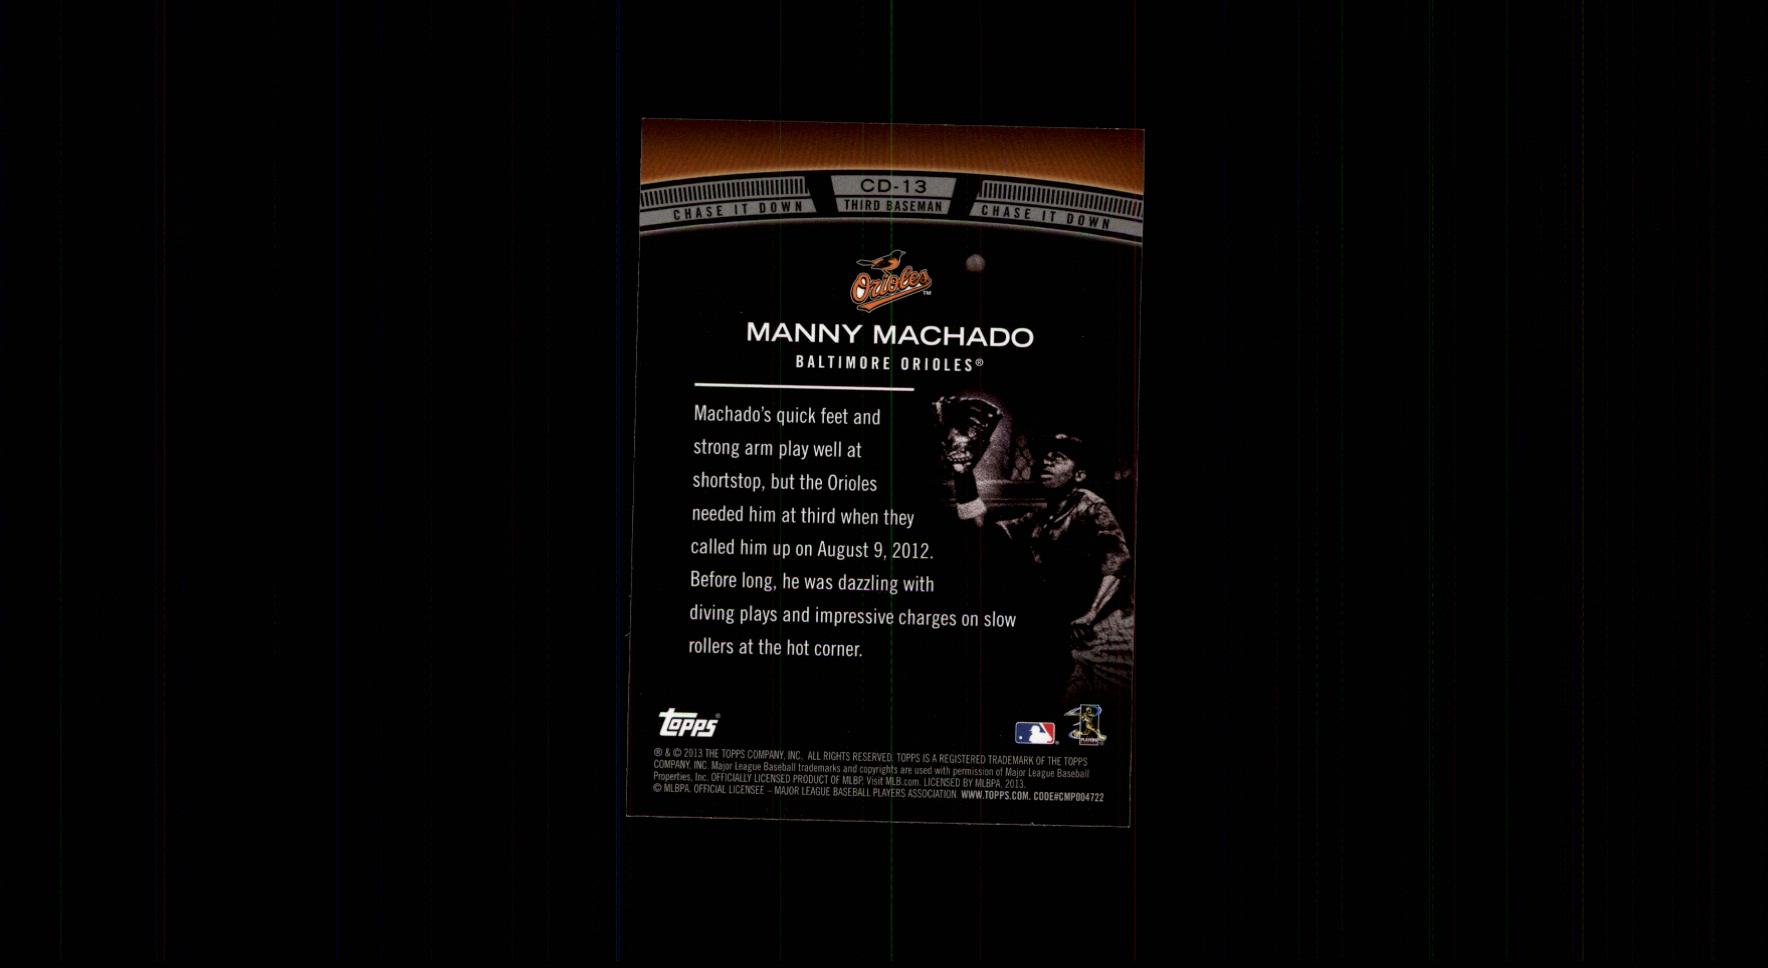 2013 Topps Chase It Down #CD13 Manny Machado back image